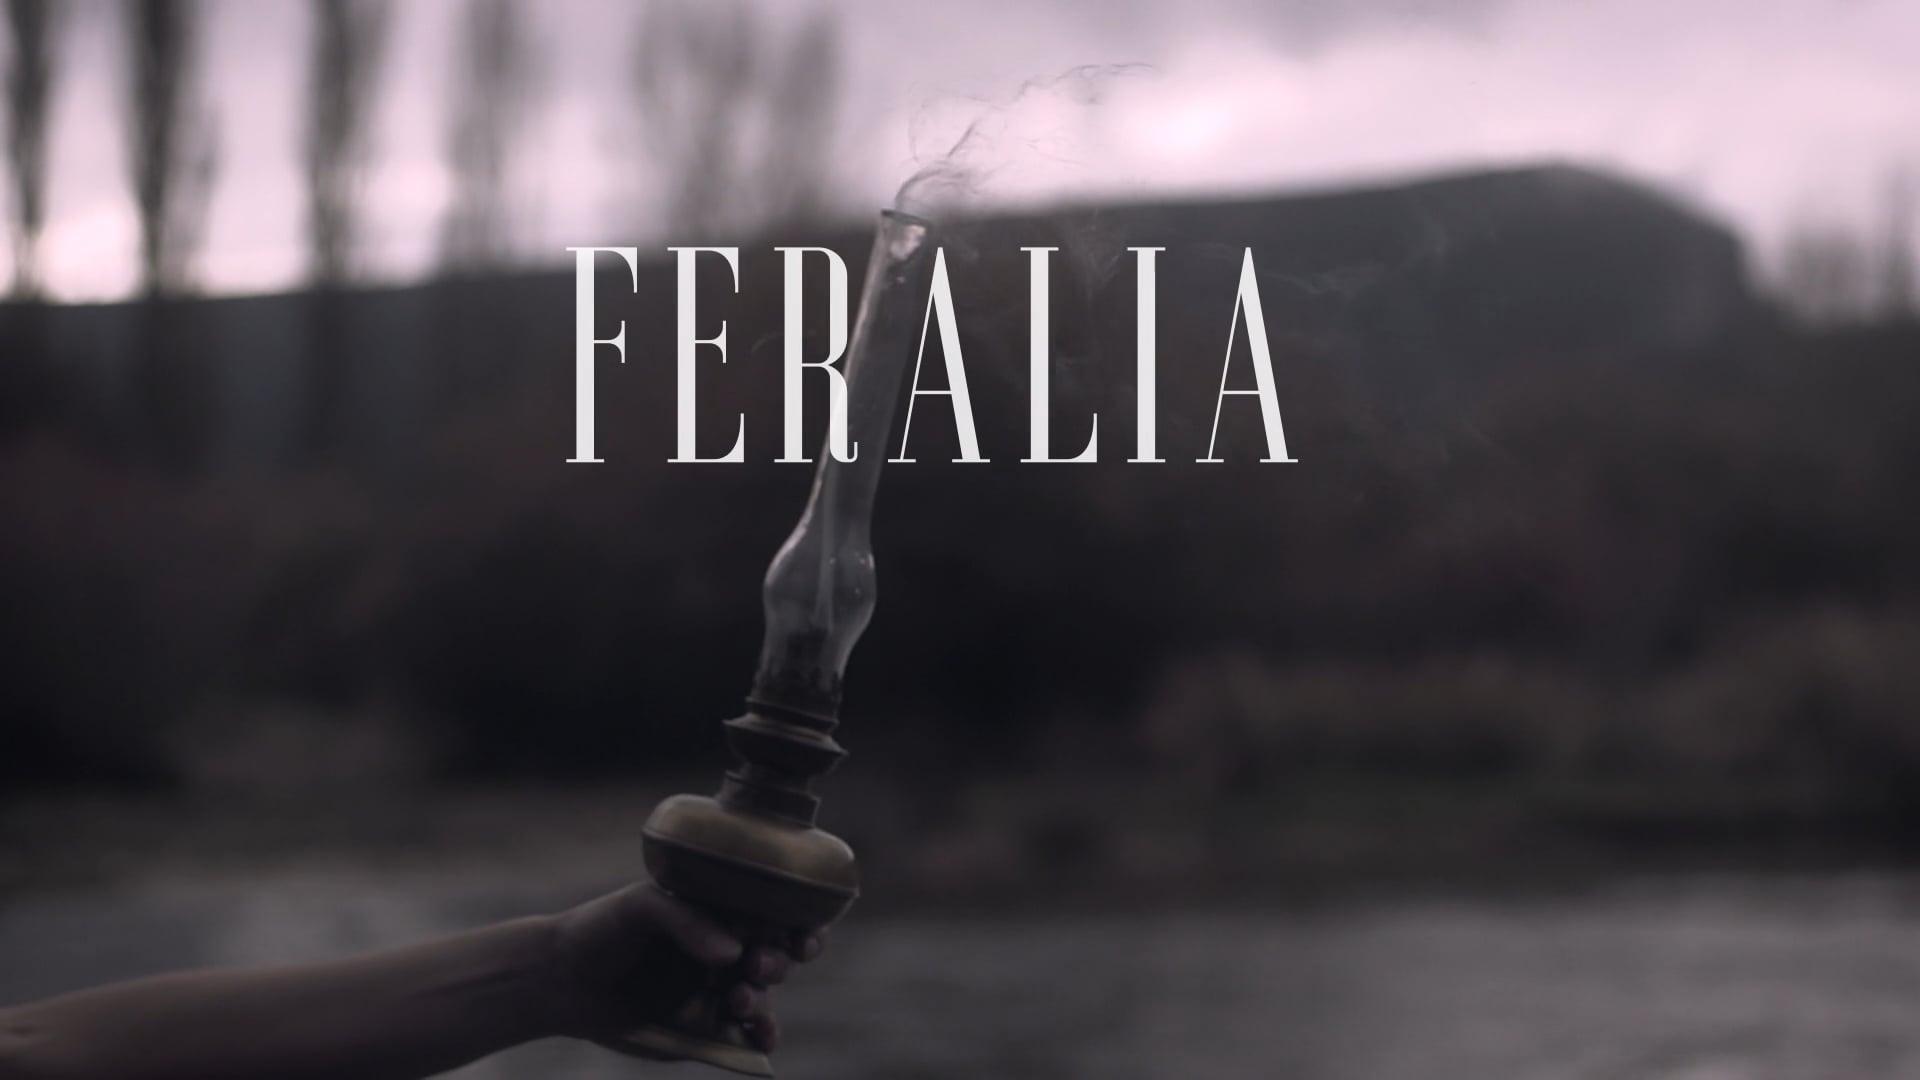 FERALIA